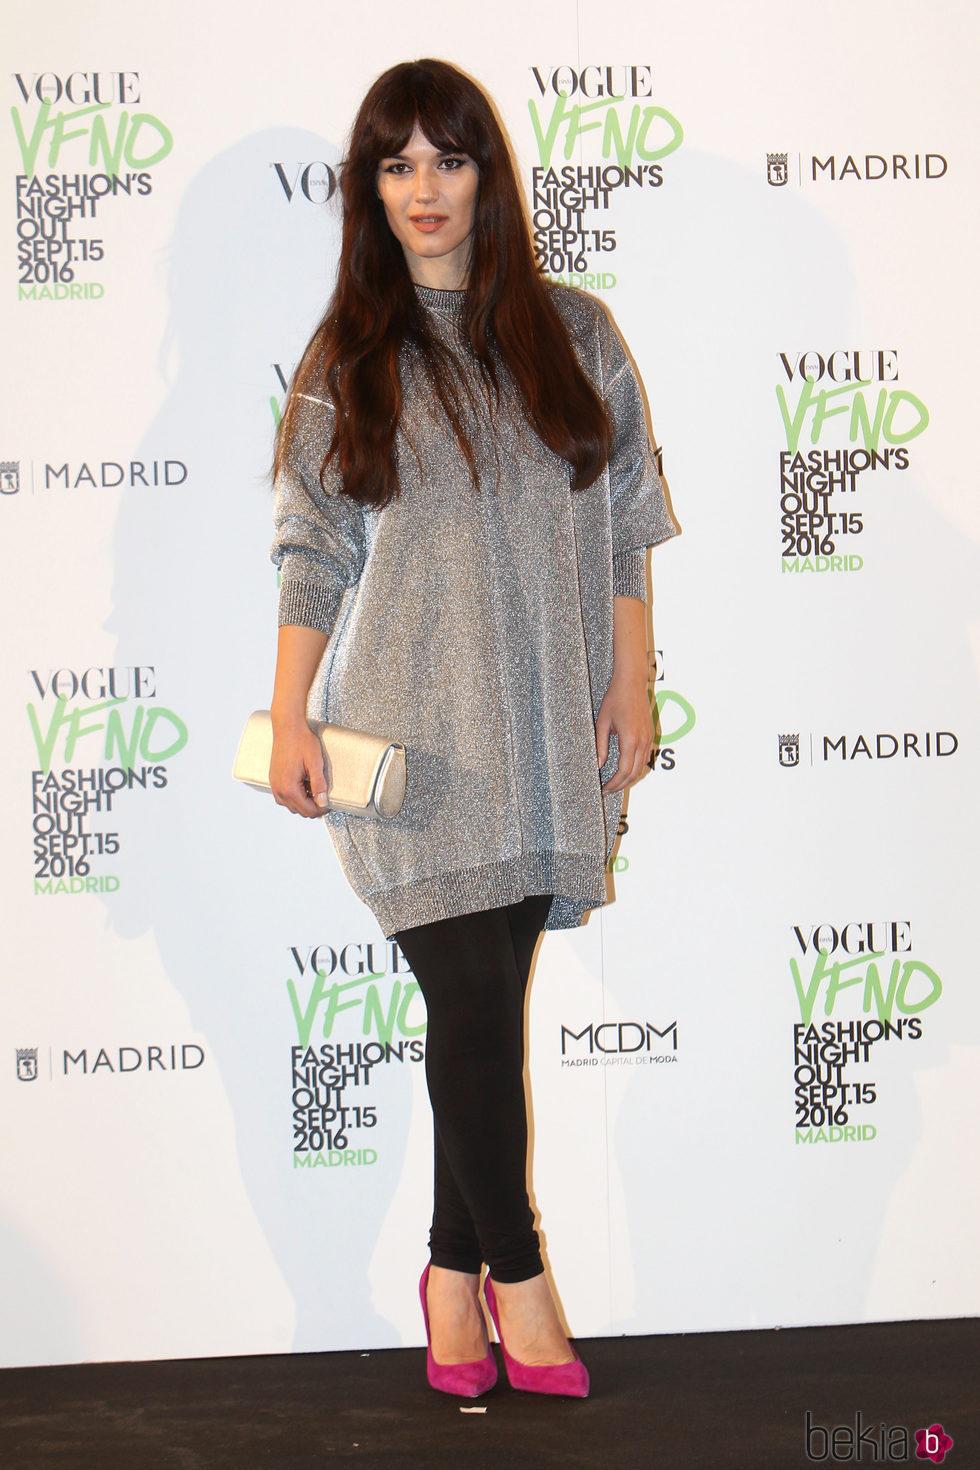 Sara Vega en el photocall de Vogue's Fashion Night Out 2016